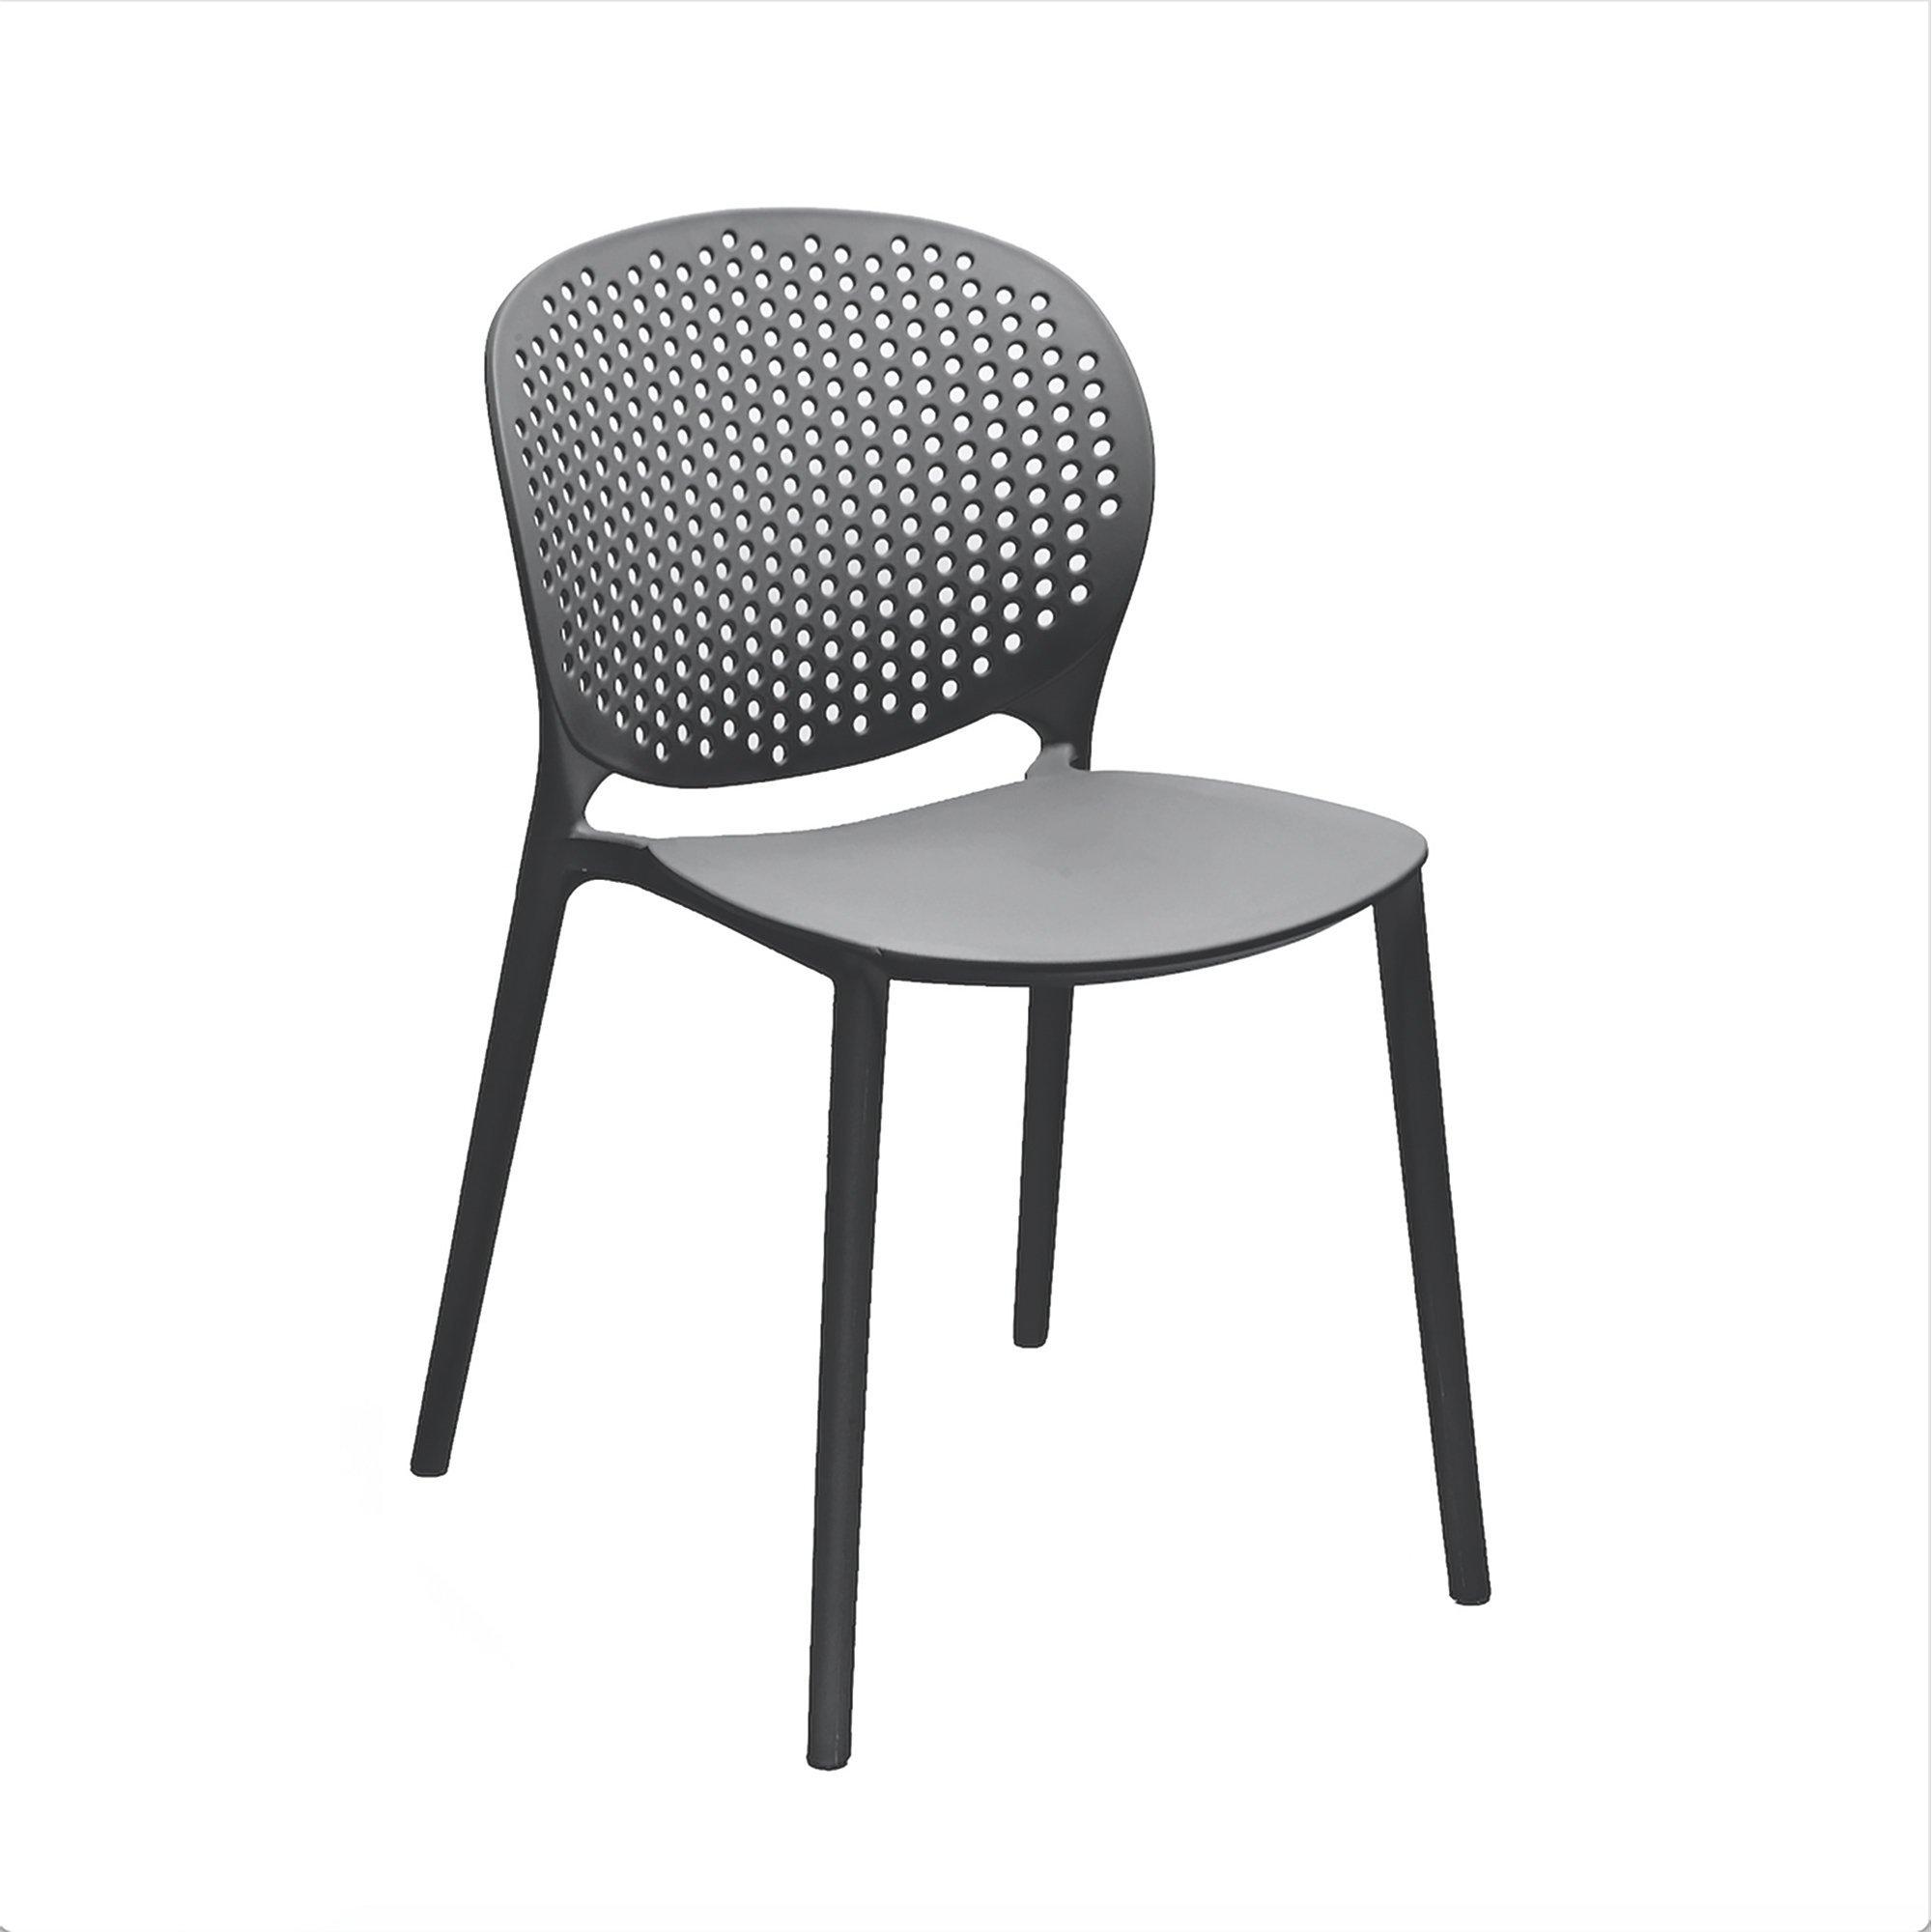 Muut Black Grey Modern Stackable Side Chair Set Of 4 Outdoor